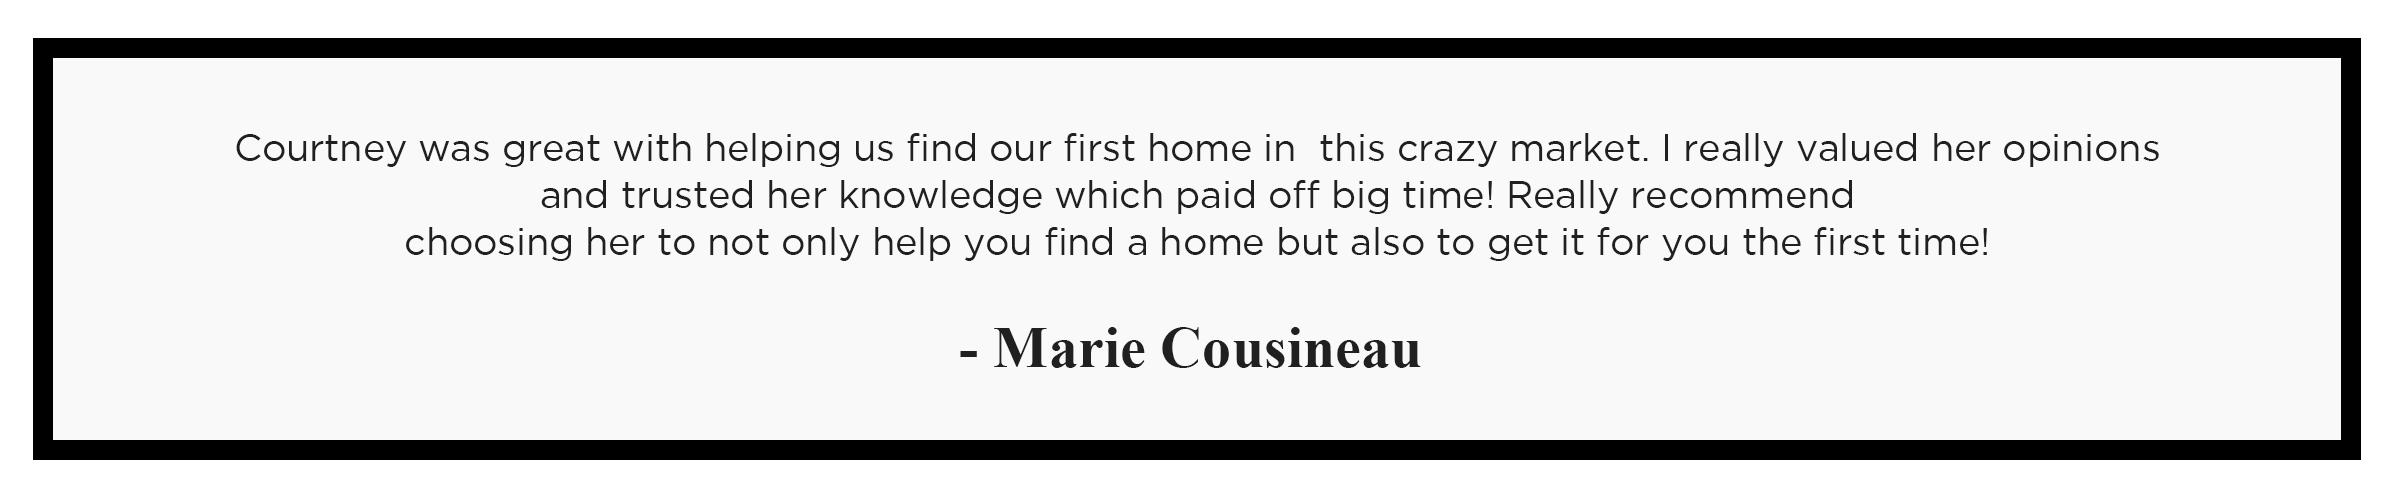 07 - marie cousineau